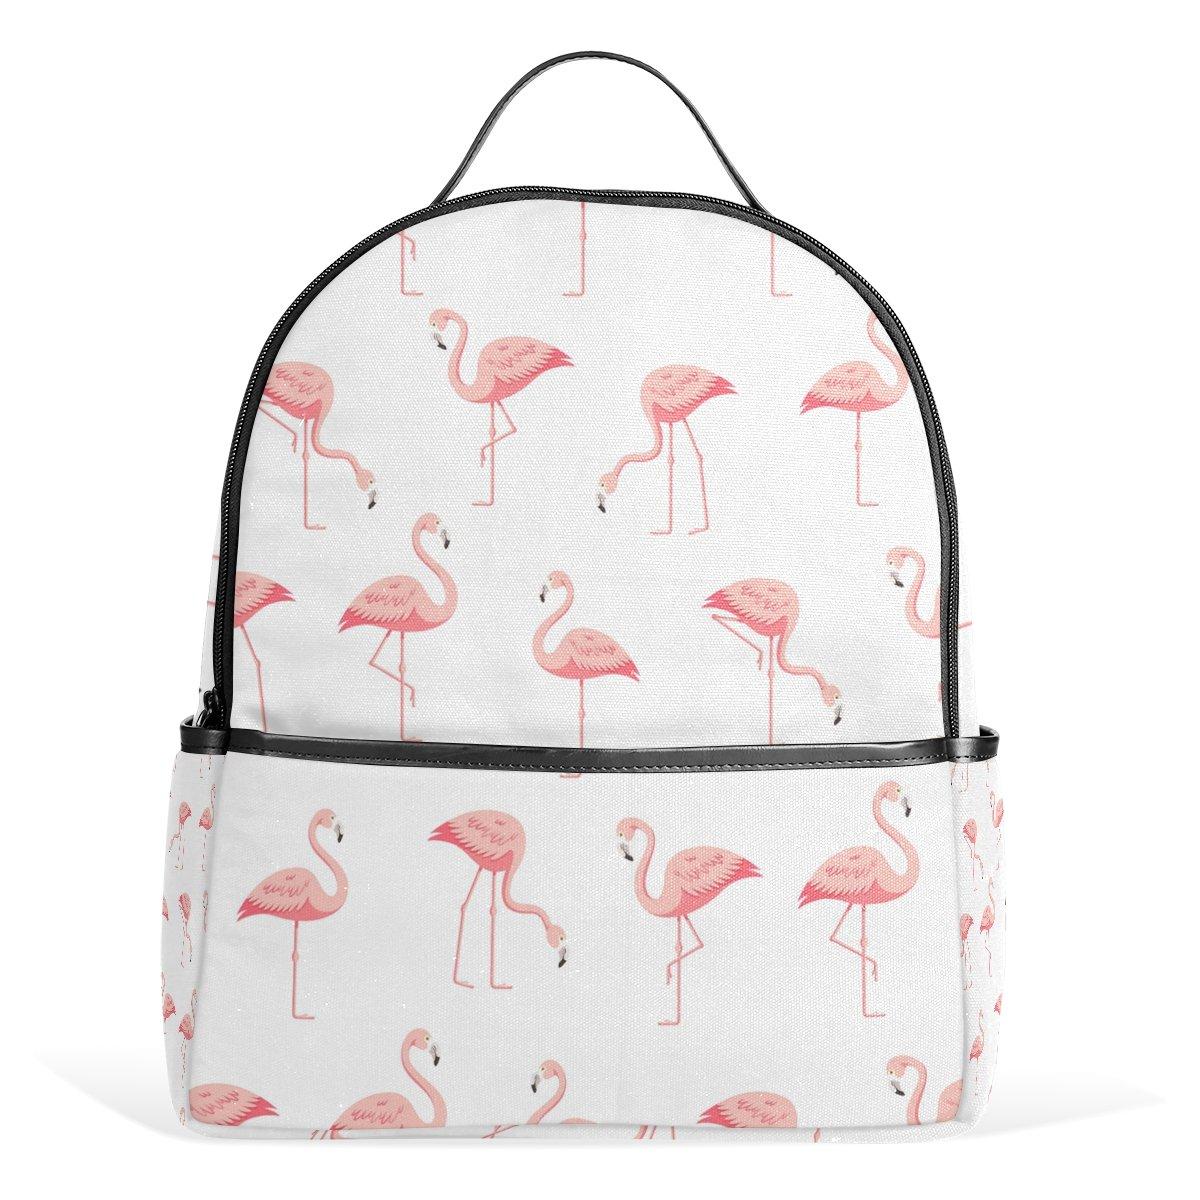 JSTEL Flamingo White School Backpack 4th 5th 6th Grade for Boys Teen Girls  Kids  Amazon.co.uk  Clothing 8c543bea61310